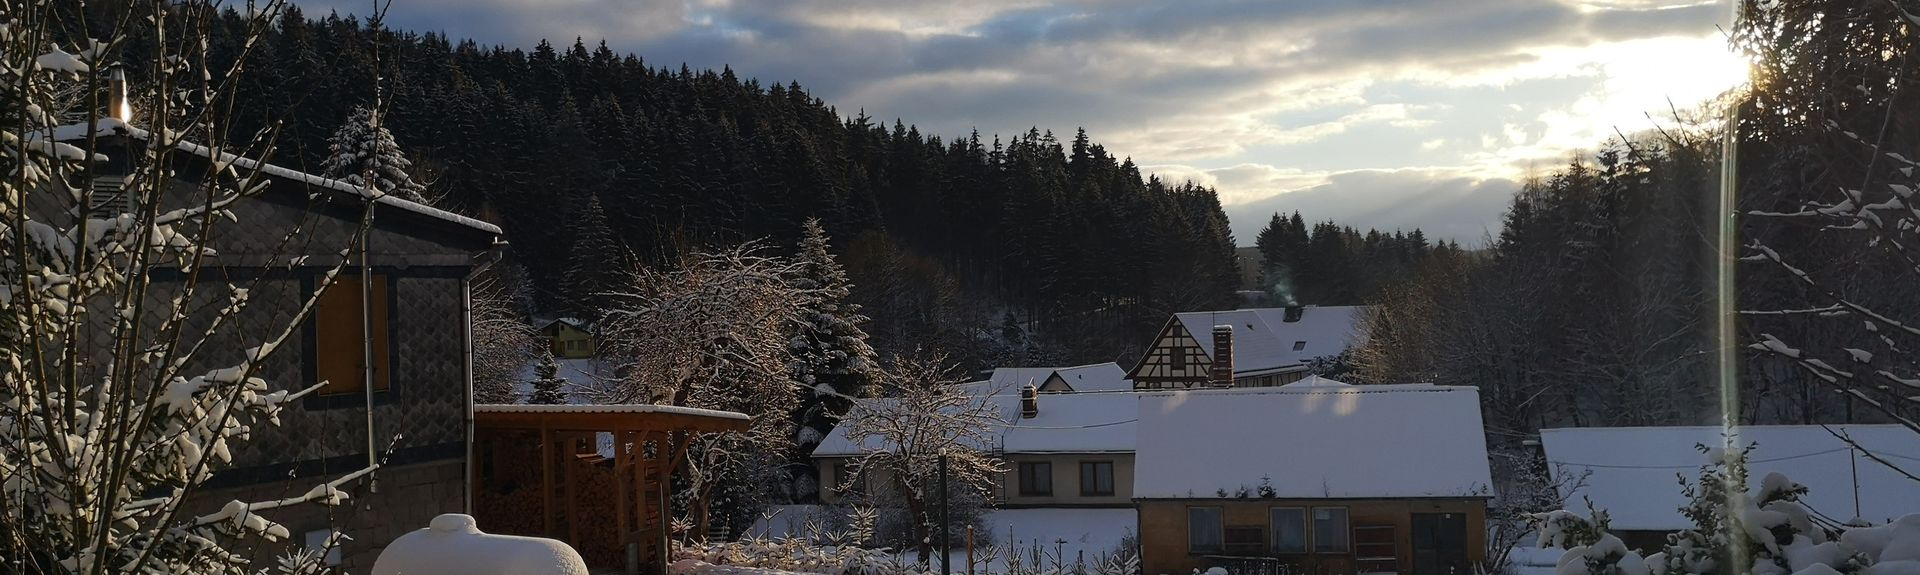 Ruhla, Thüringen, Deutschland